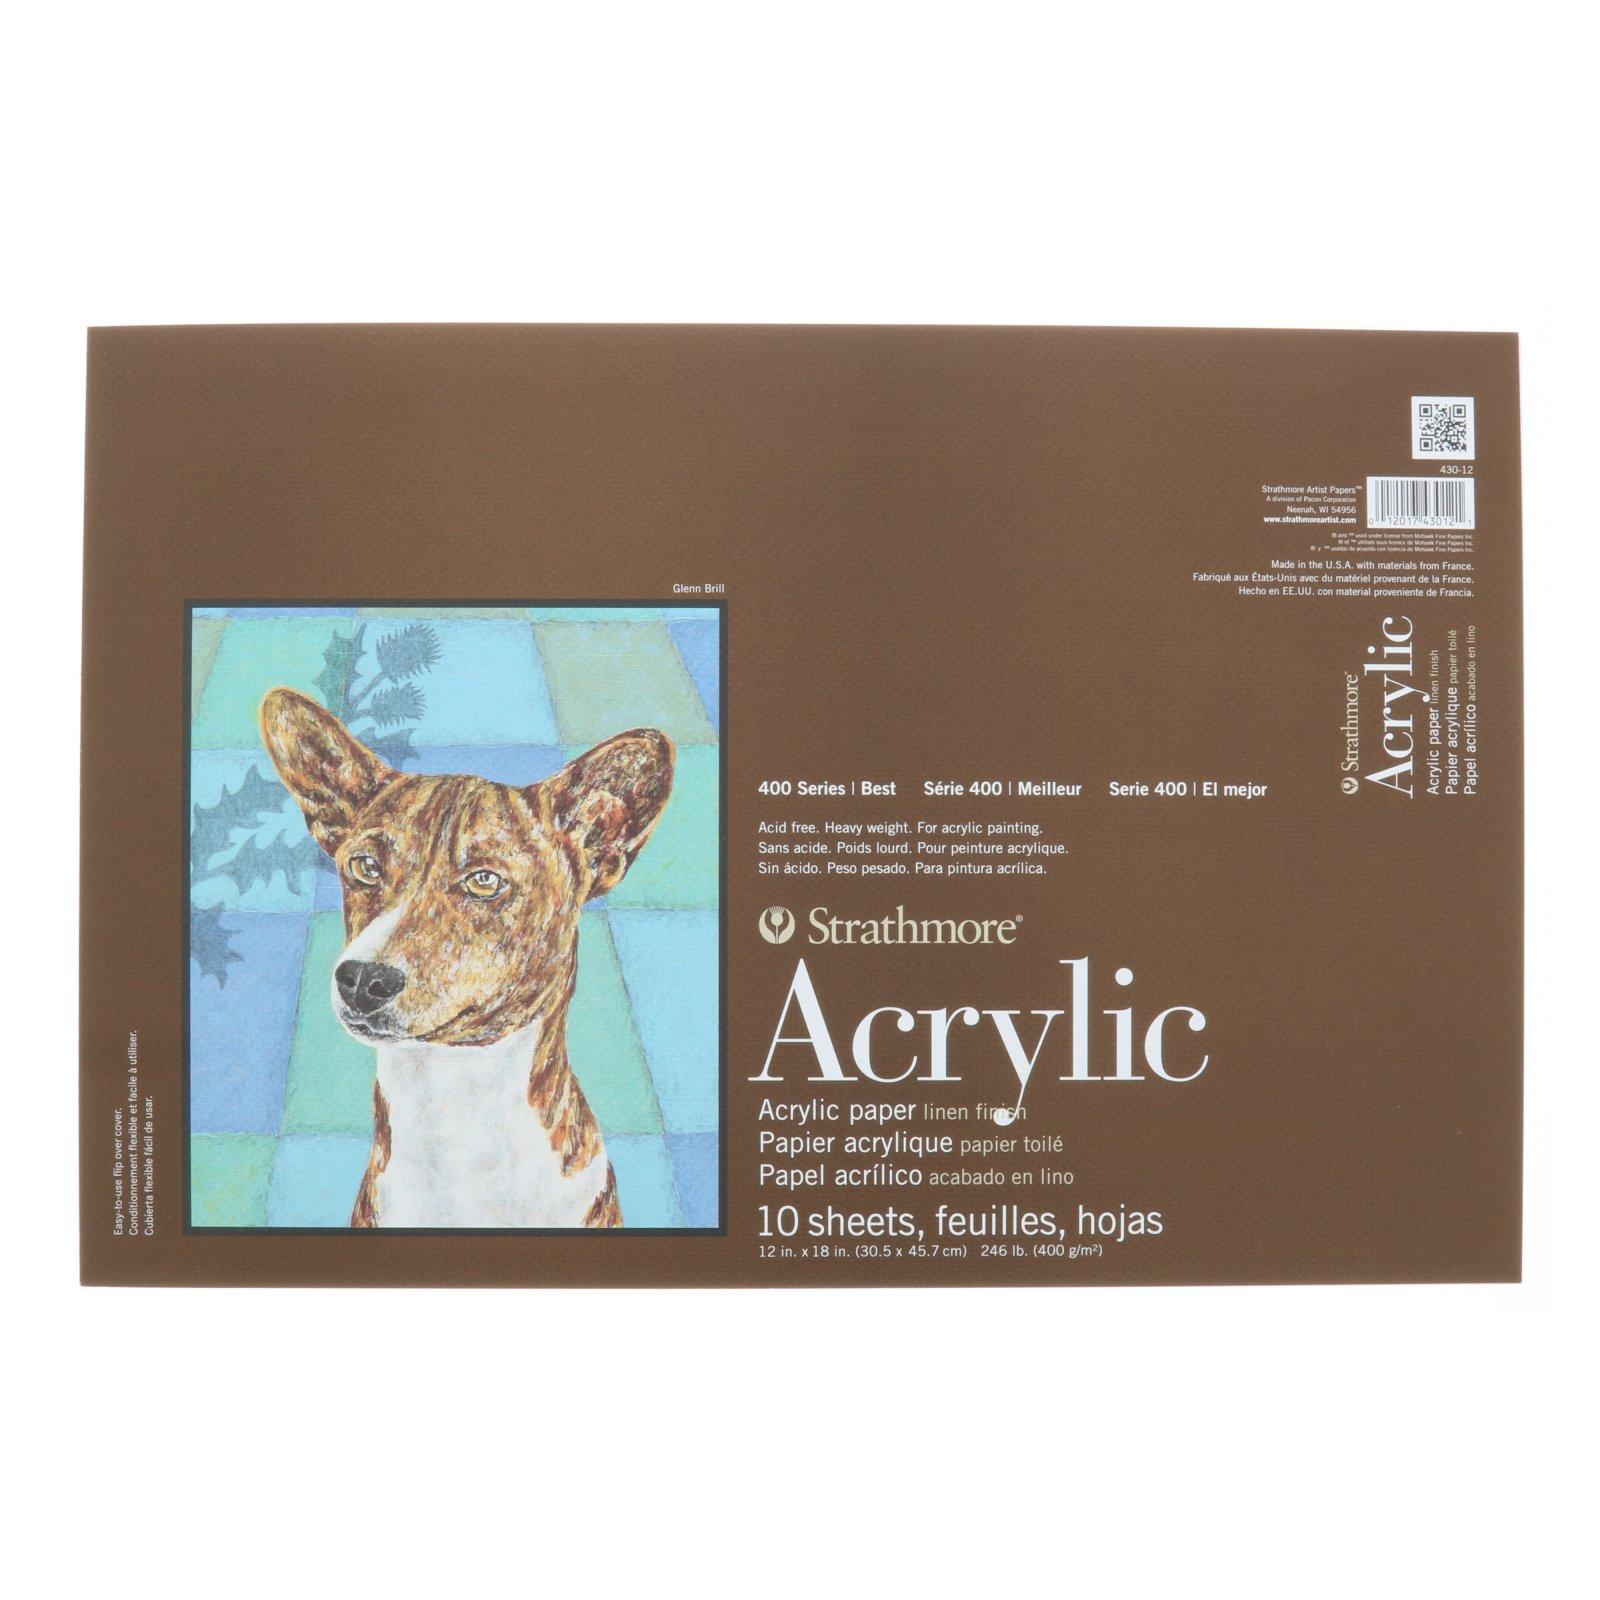 ACRYLIC 400 TB 12X18 10 SHEETS